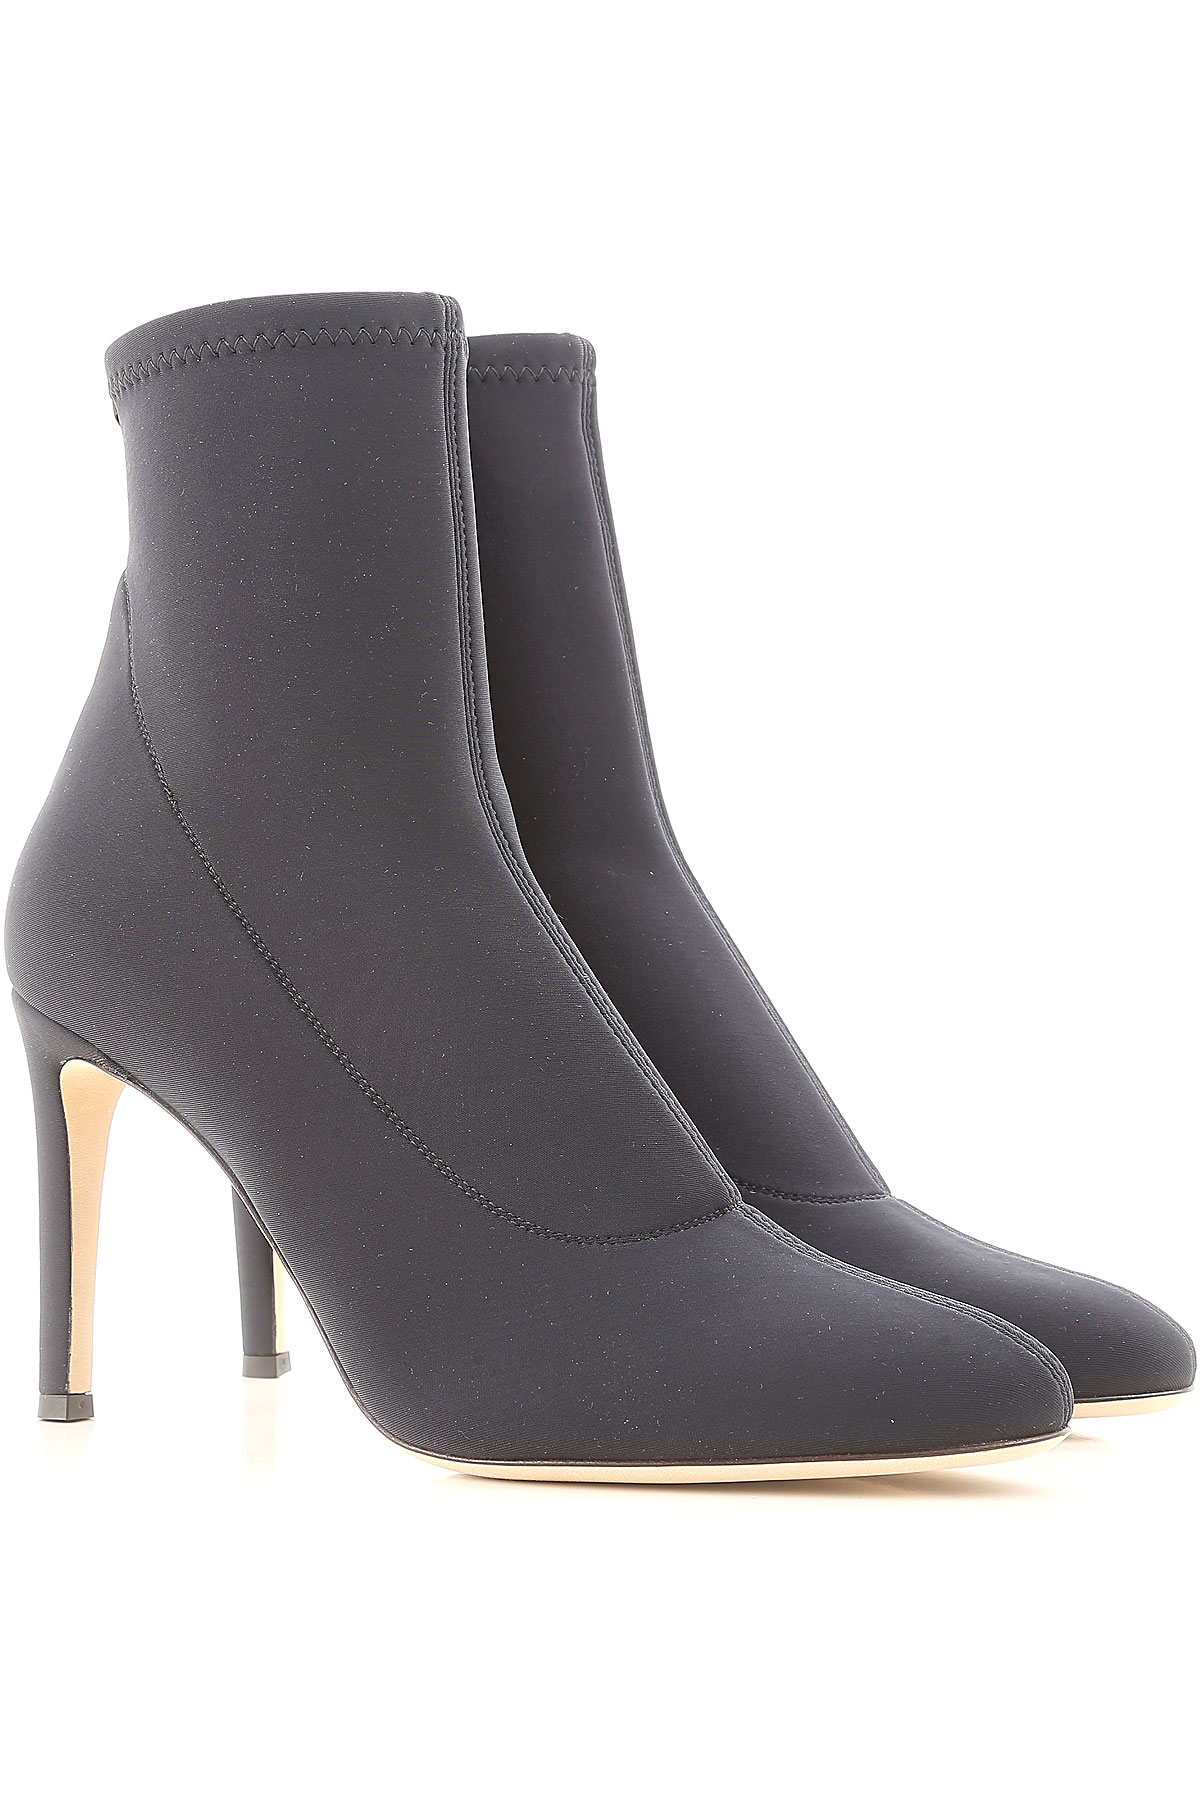 Giuseppe Zanotti Design Boots for Women, Booties On Sale in Outlet, Black, Neoprene, 2019, 8 8.5